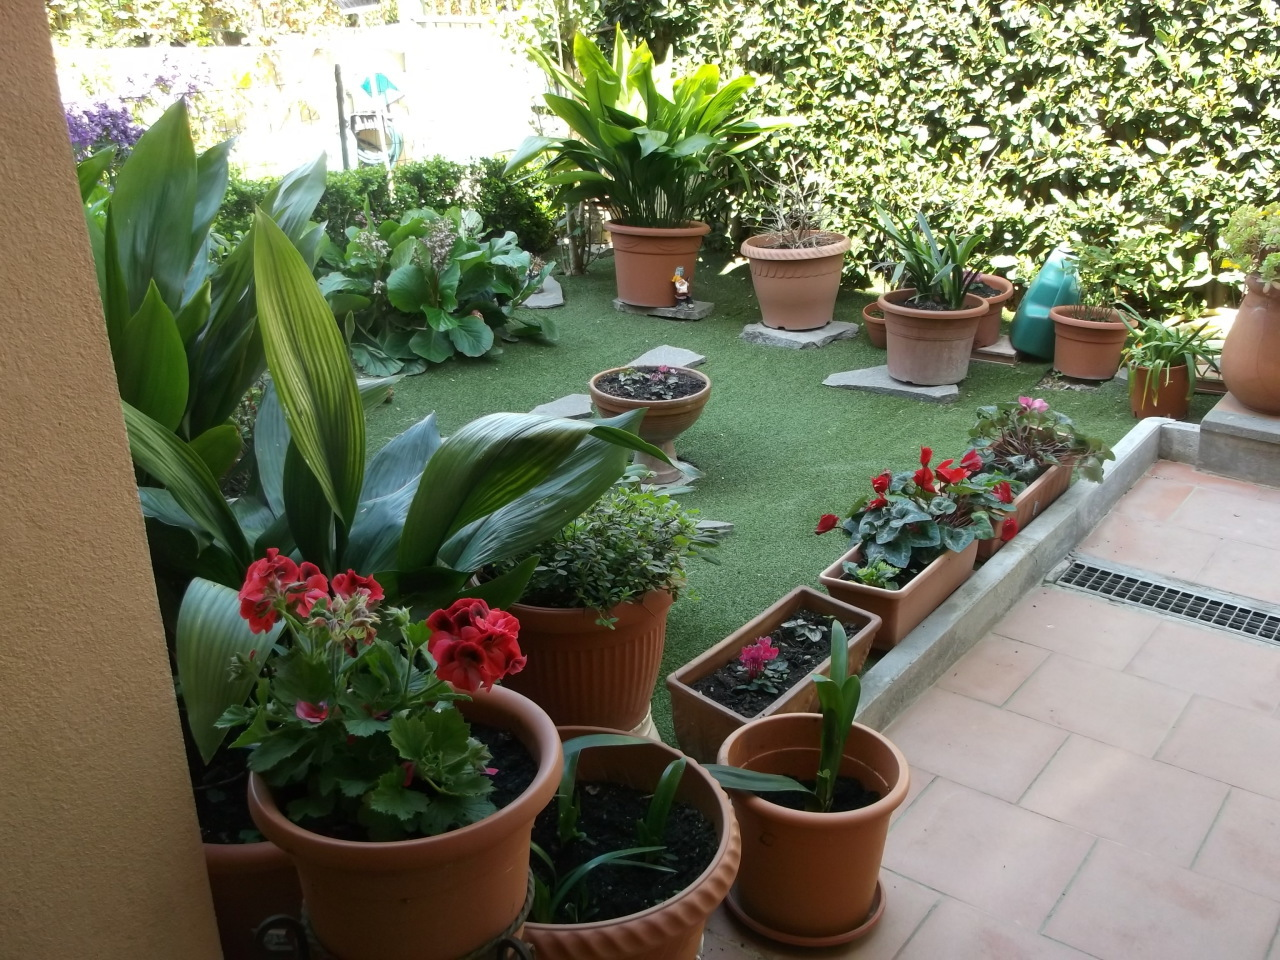 BH - Giardino 1, Ingresso e Passo Rifatto Lato N-O